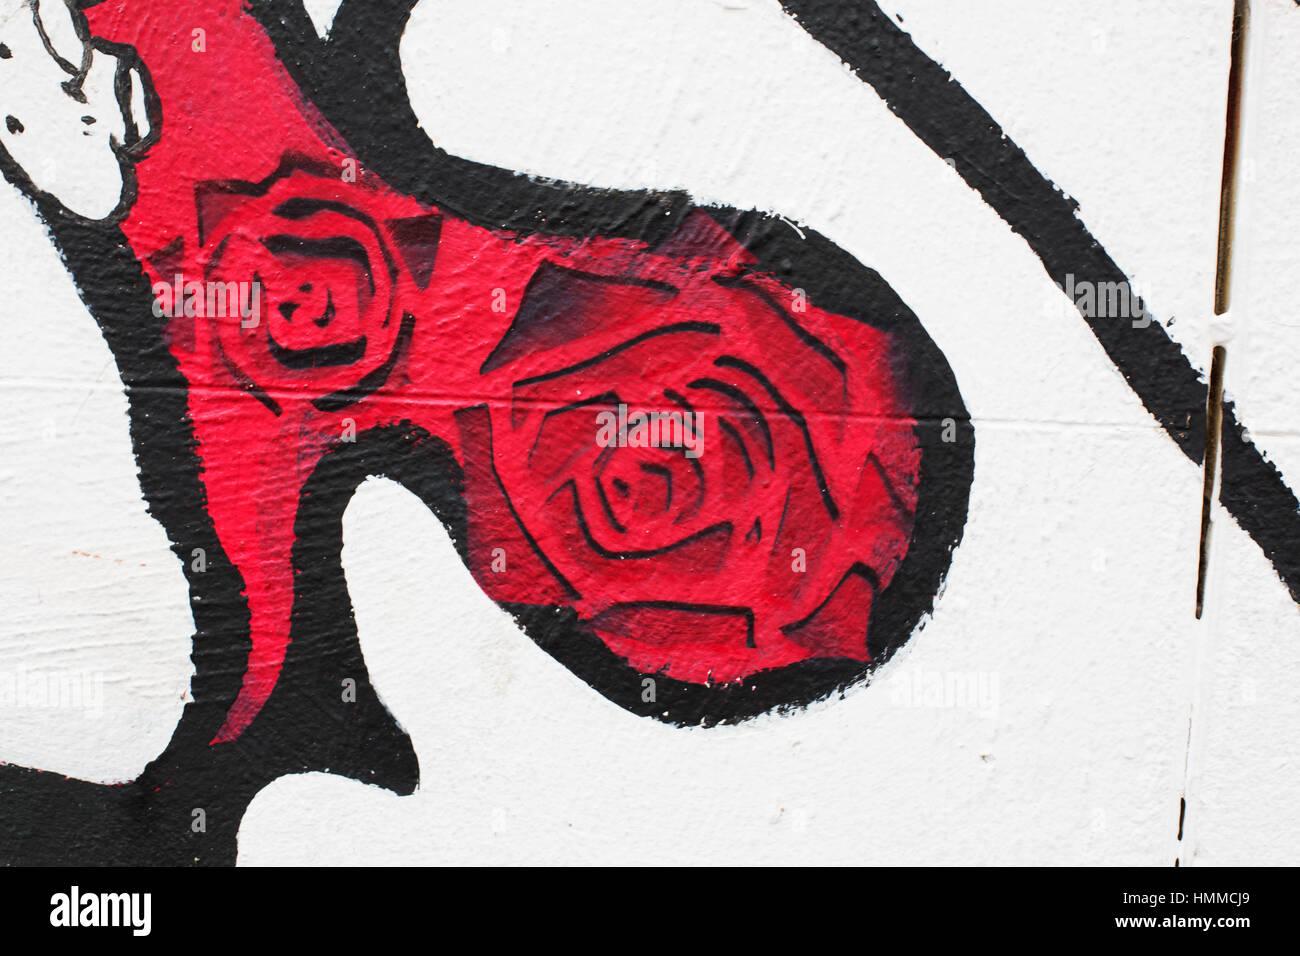 Rose graffiti stokes croft 2017 stock image